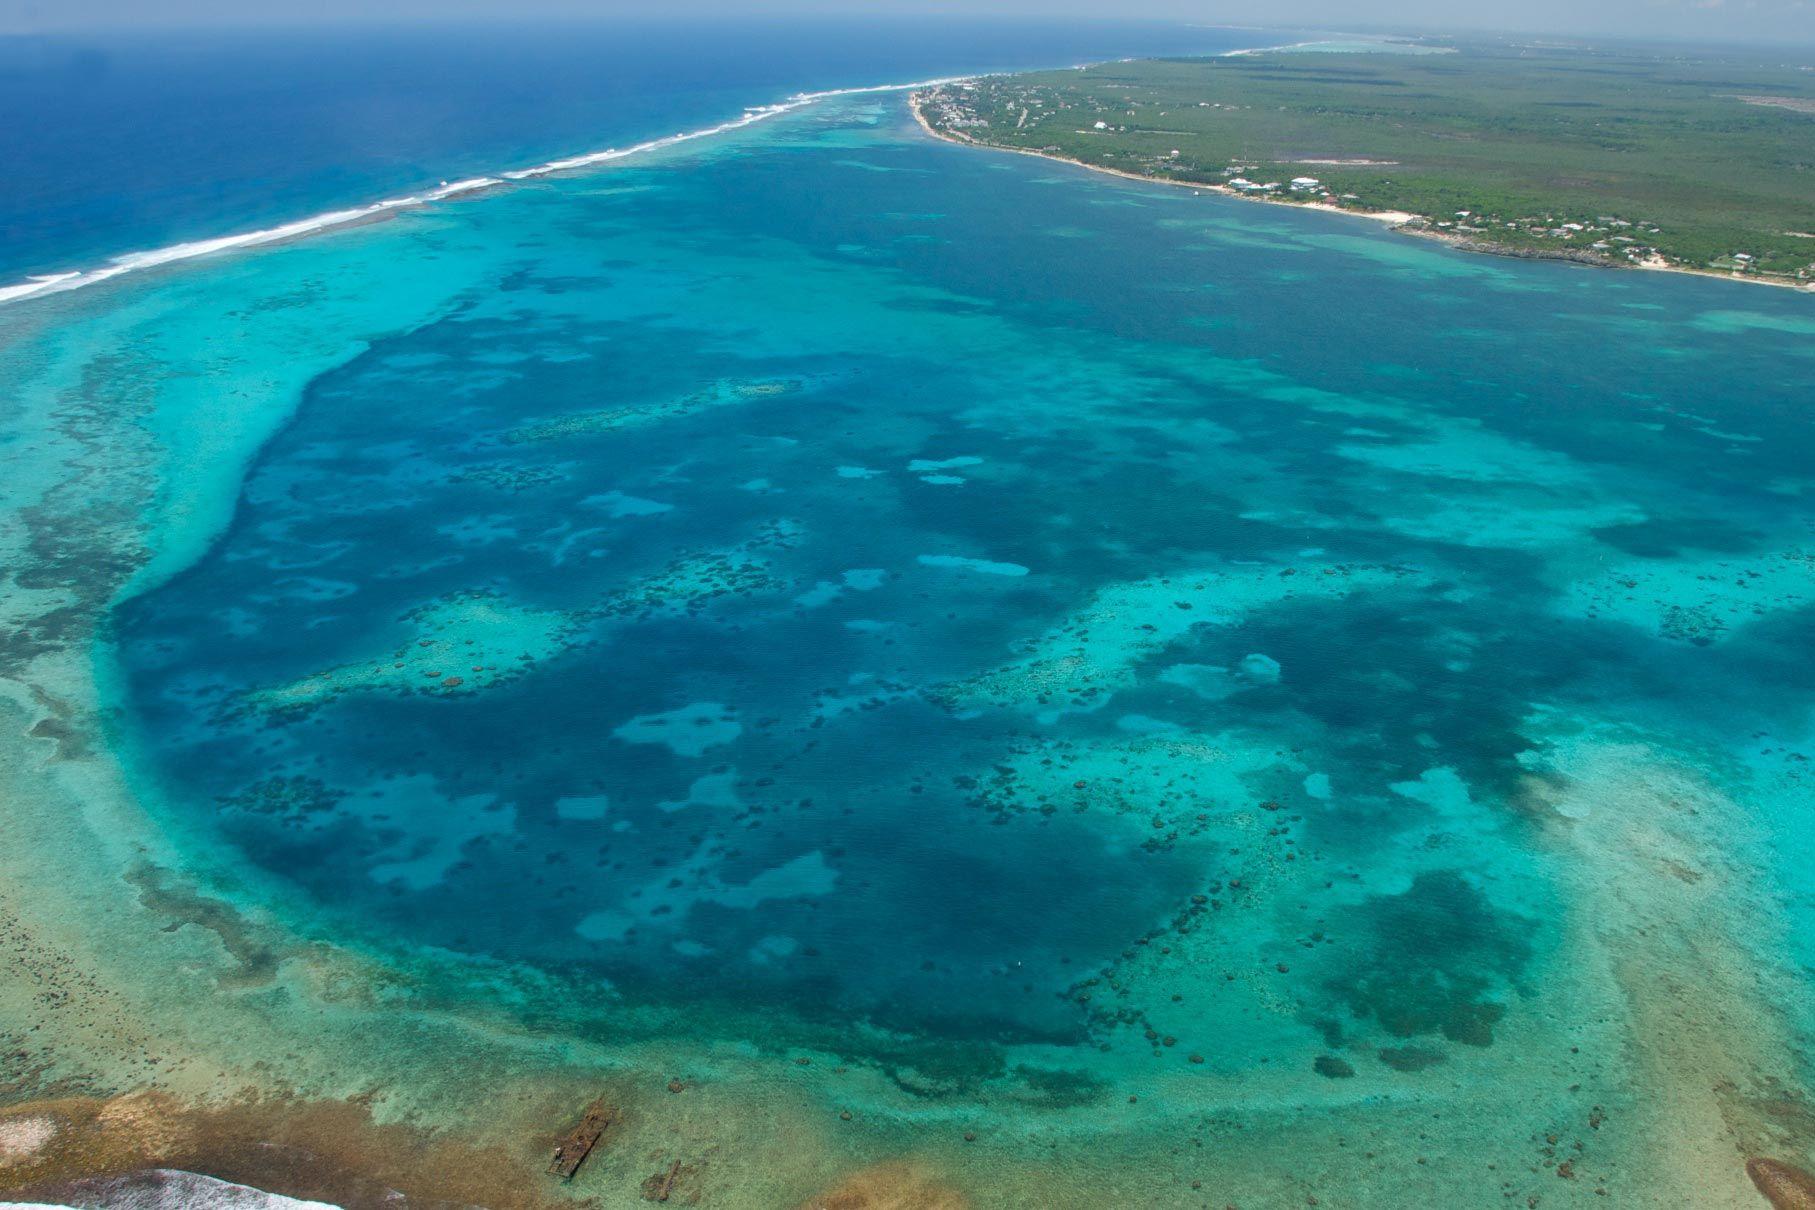 Ocean Frontiers- Grand Cayman, Cayman Islands